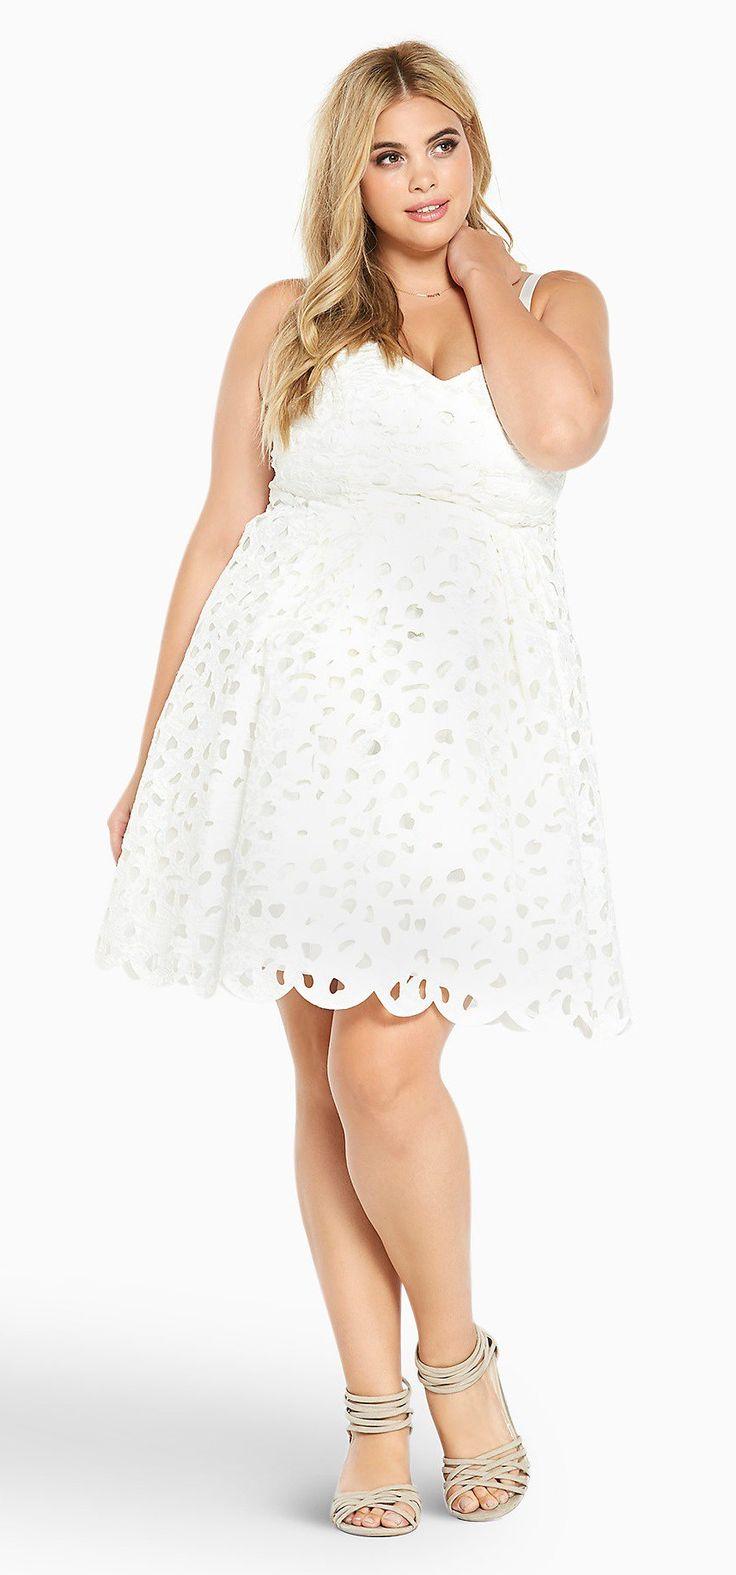 Best 25+ Bridal shower guest outfit ideas on Pinterest ...